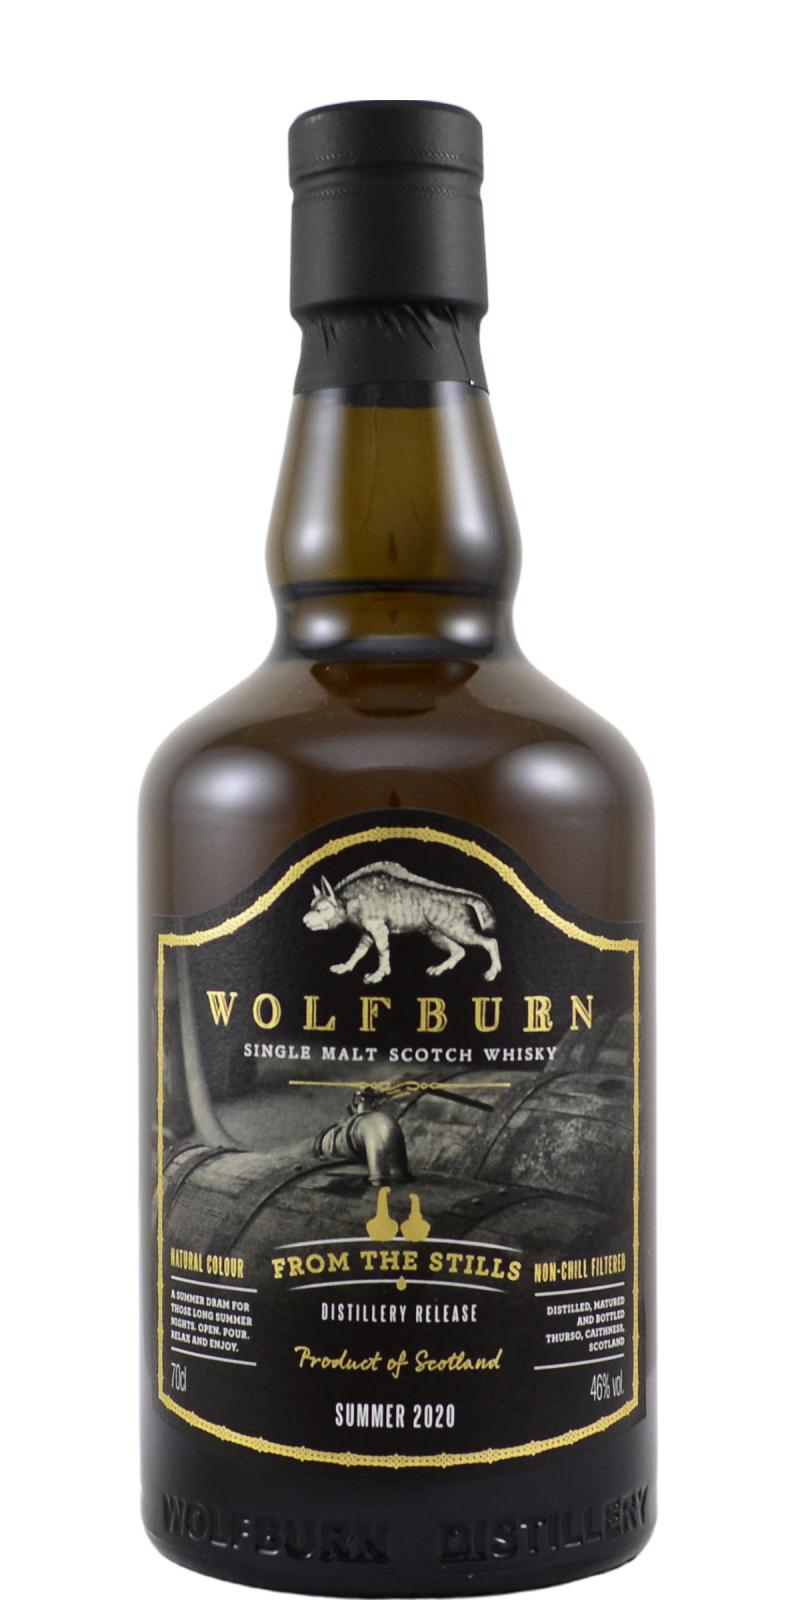 Wolfburn 05-year-old